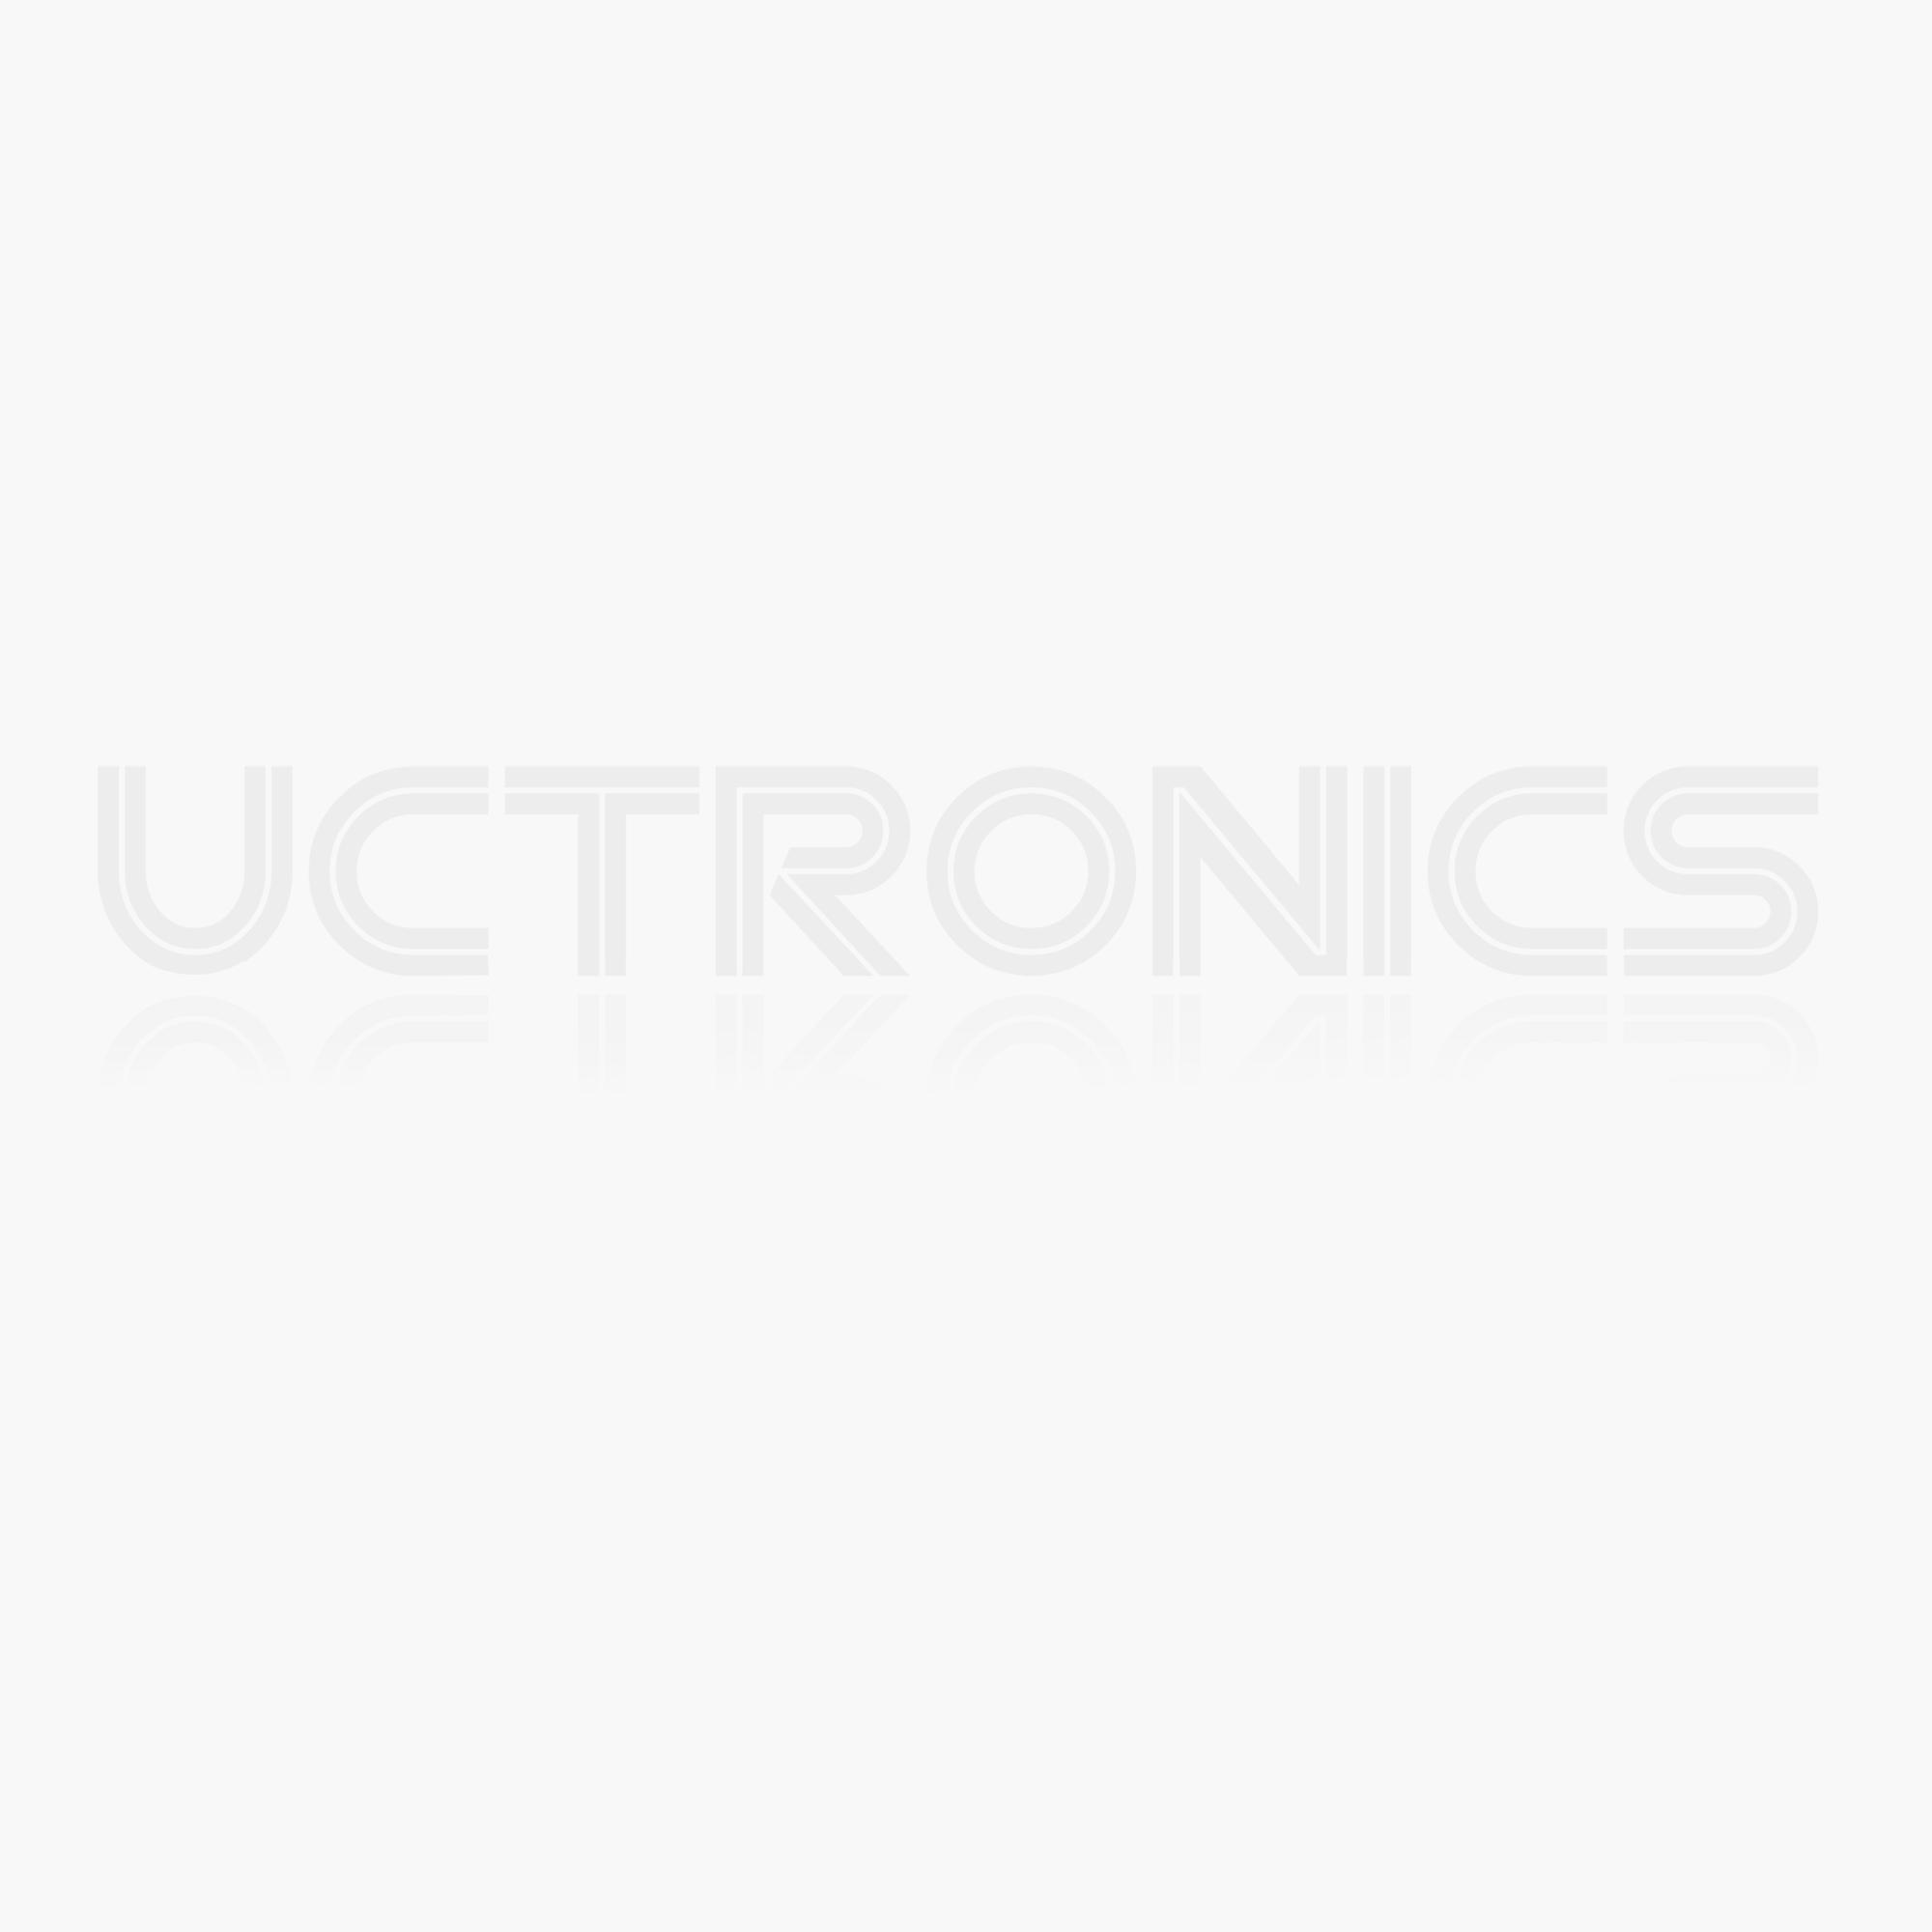 A4988 Stepper Motor Driver Module Green PCB for CNC 3D Printer RepRap StepStick